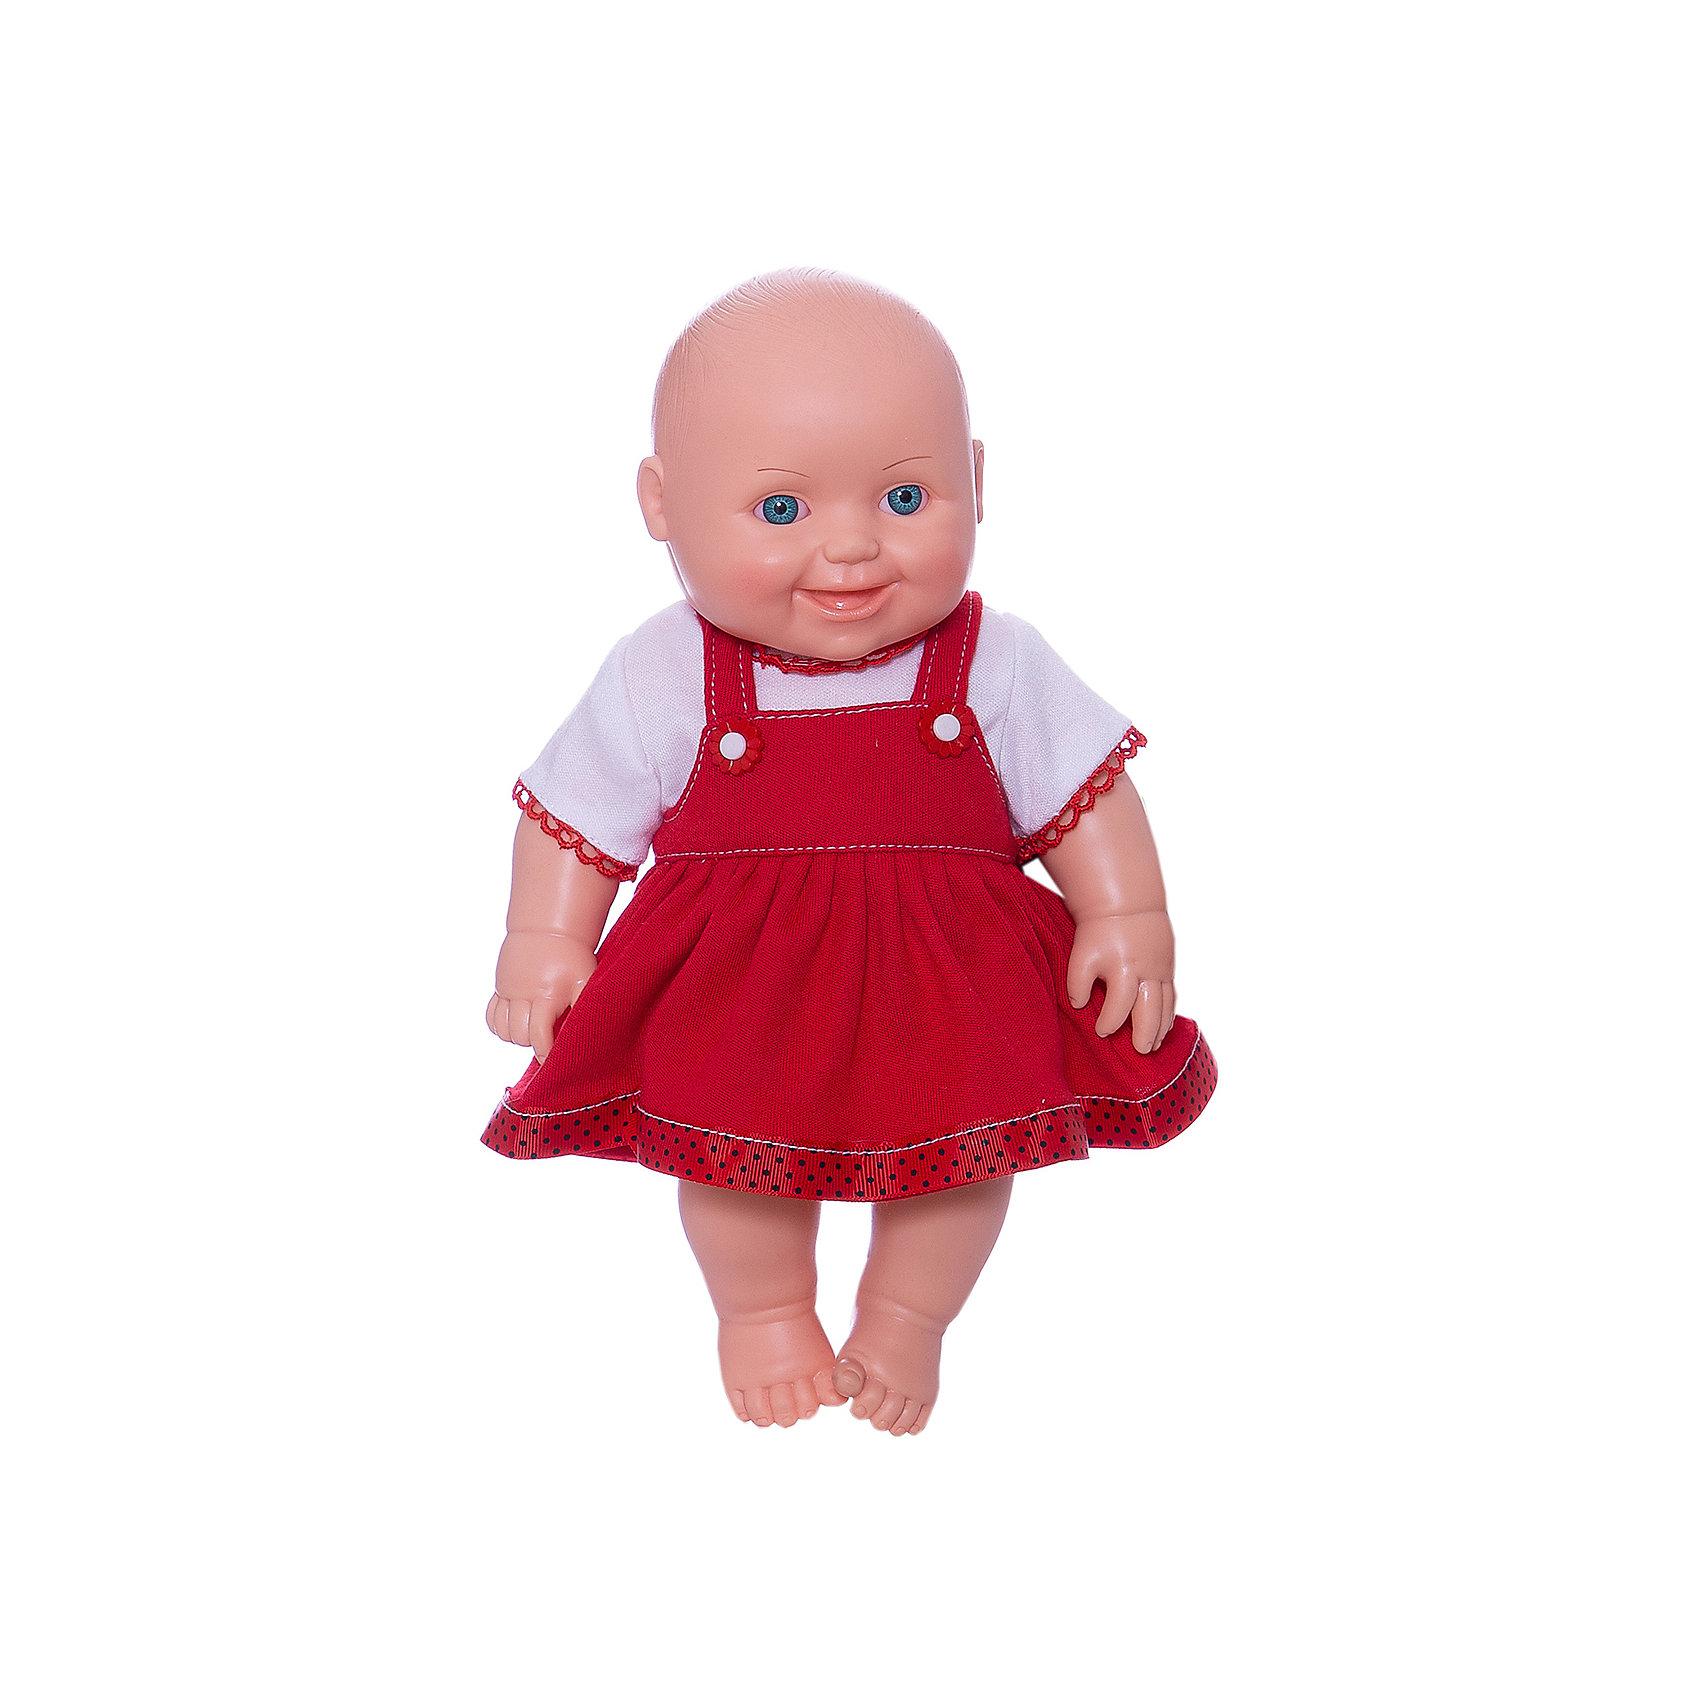 Весна Кукла Малышка 7, девочка, 31 см, Весна кукла весна кукла алла 7 35 см